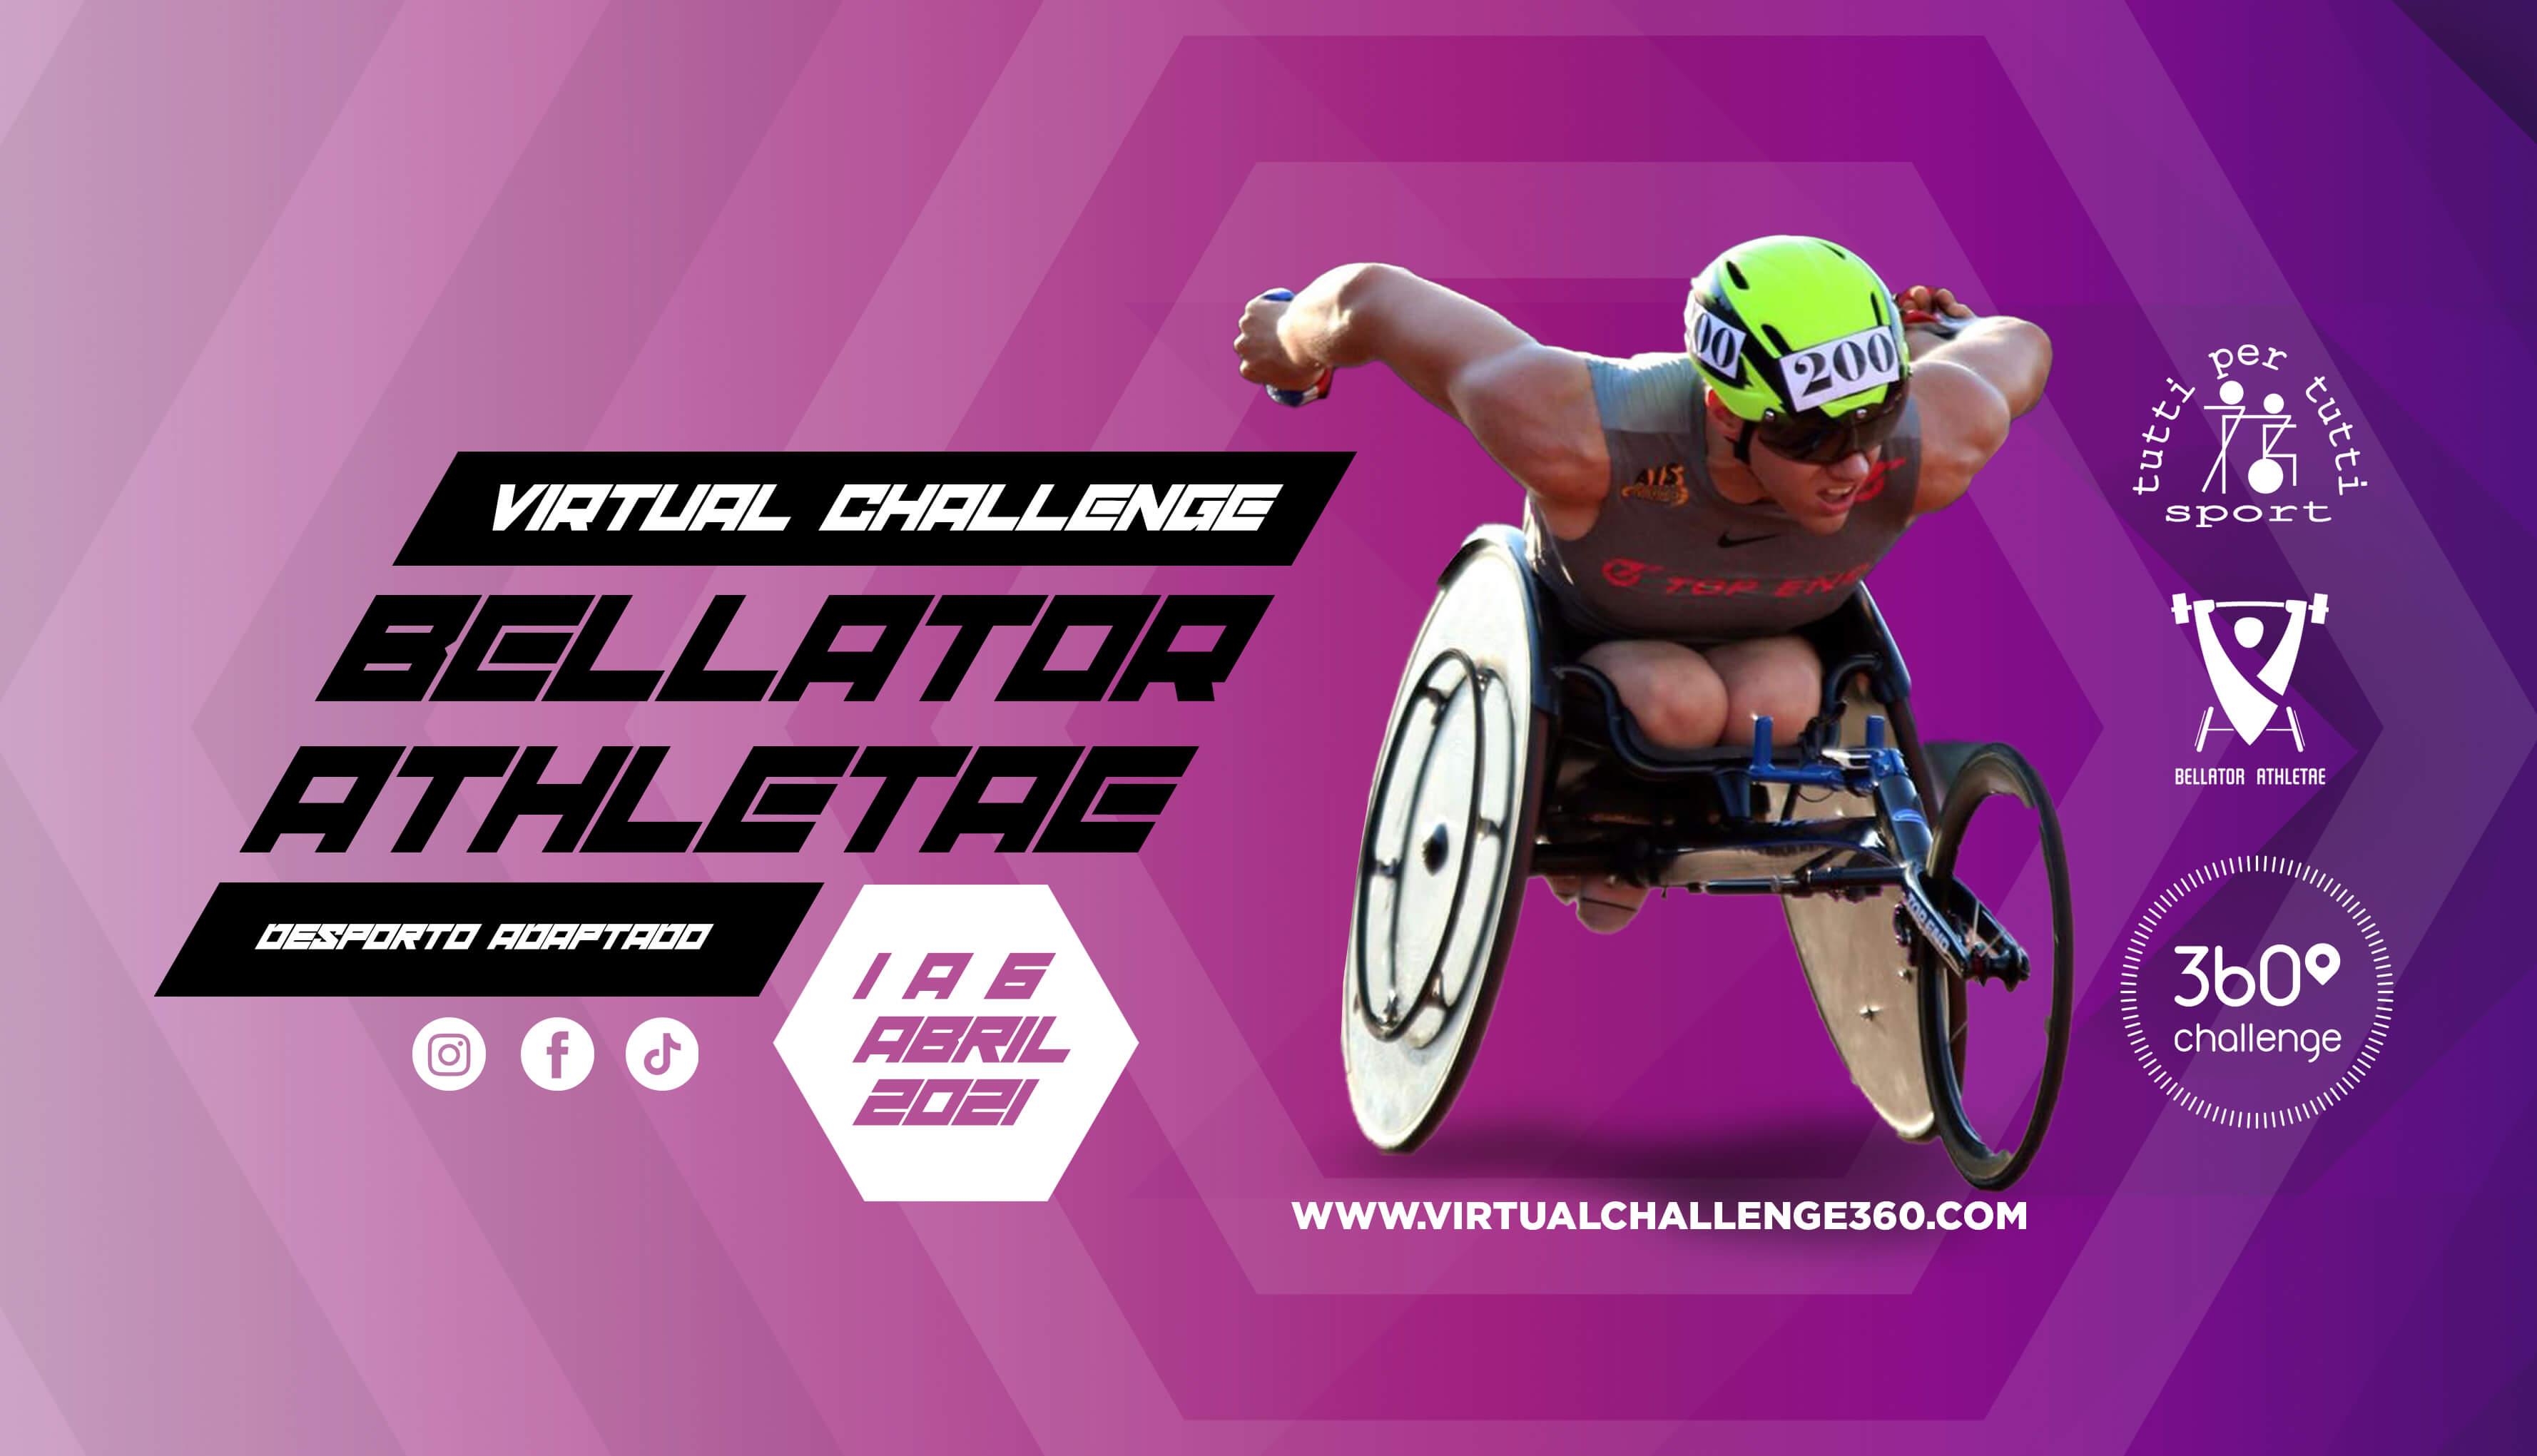 Virtual Challenge Bellator Athletae